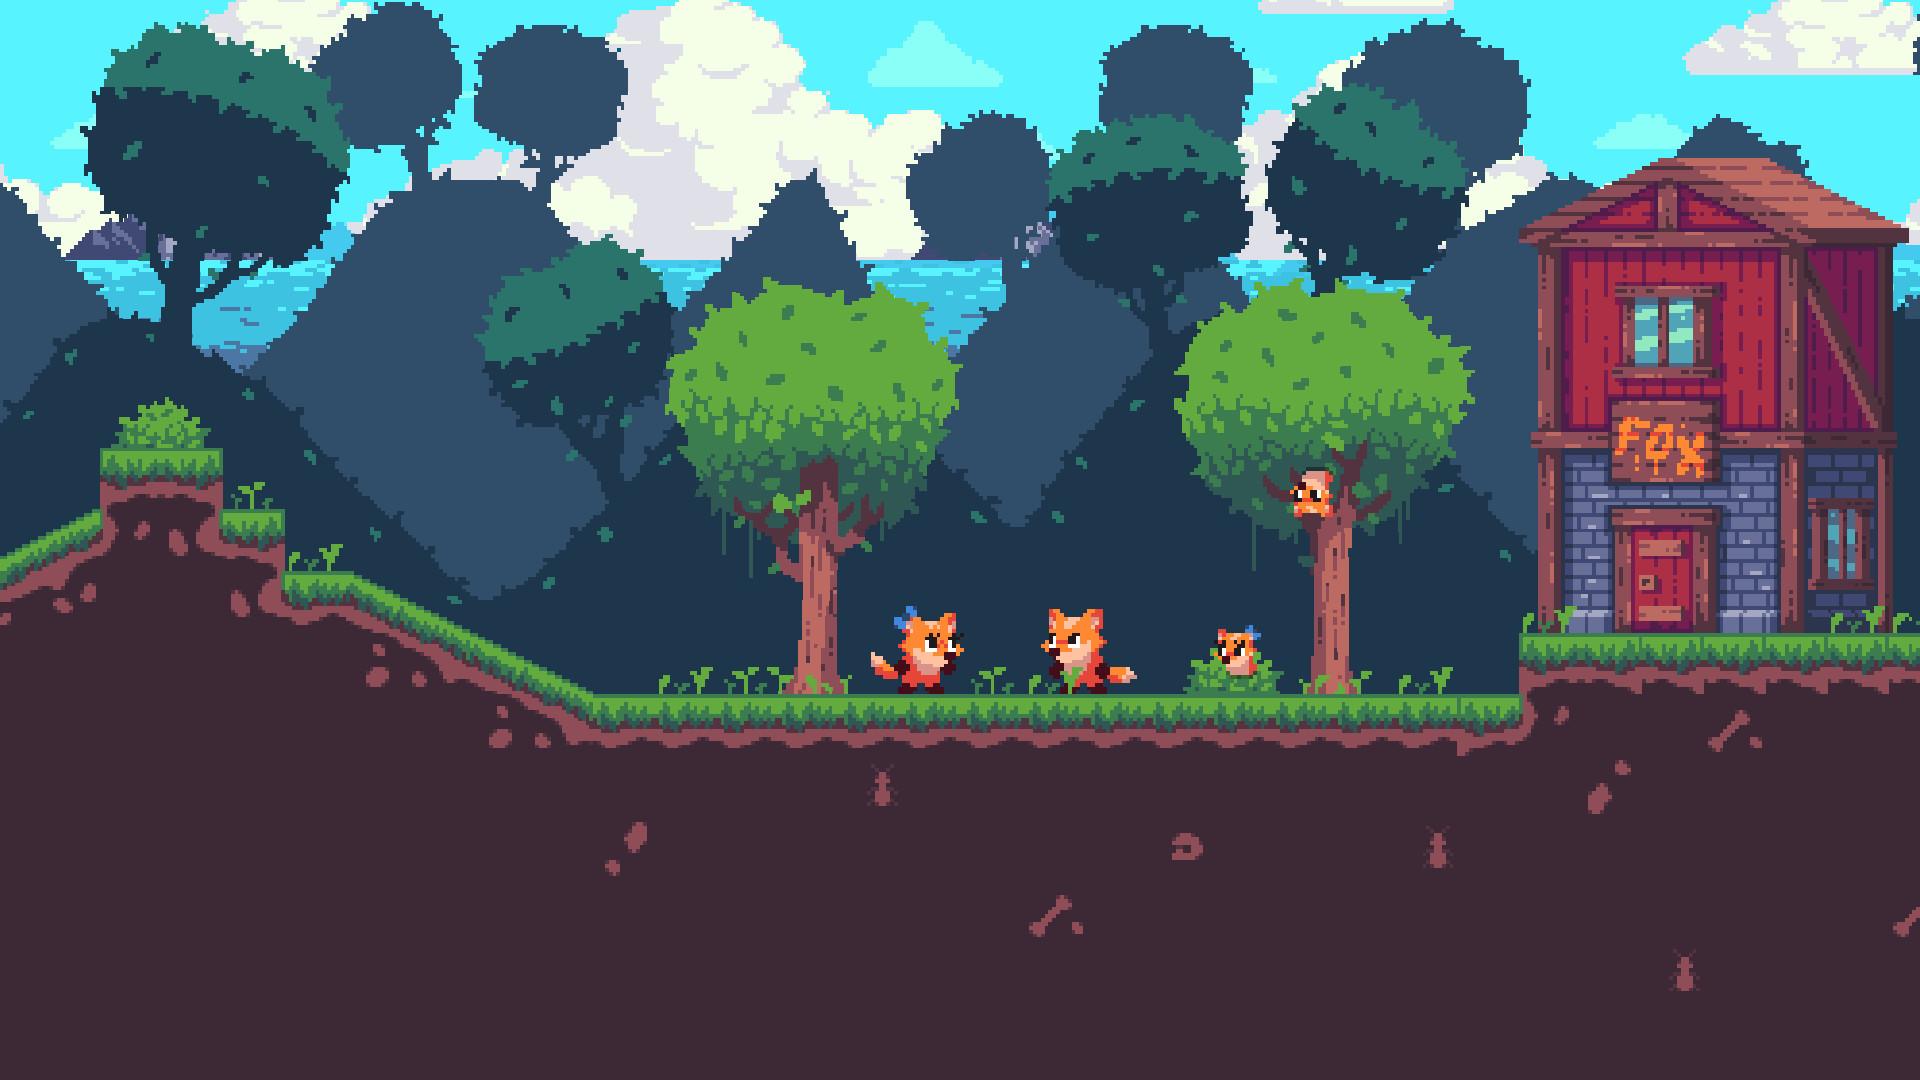 foxyland 2 video game wallpaper 69969